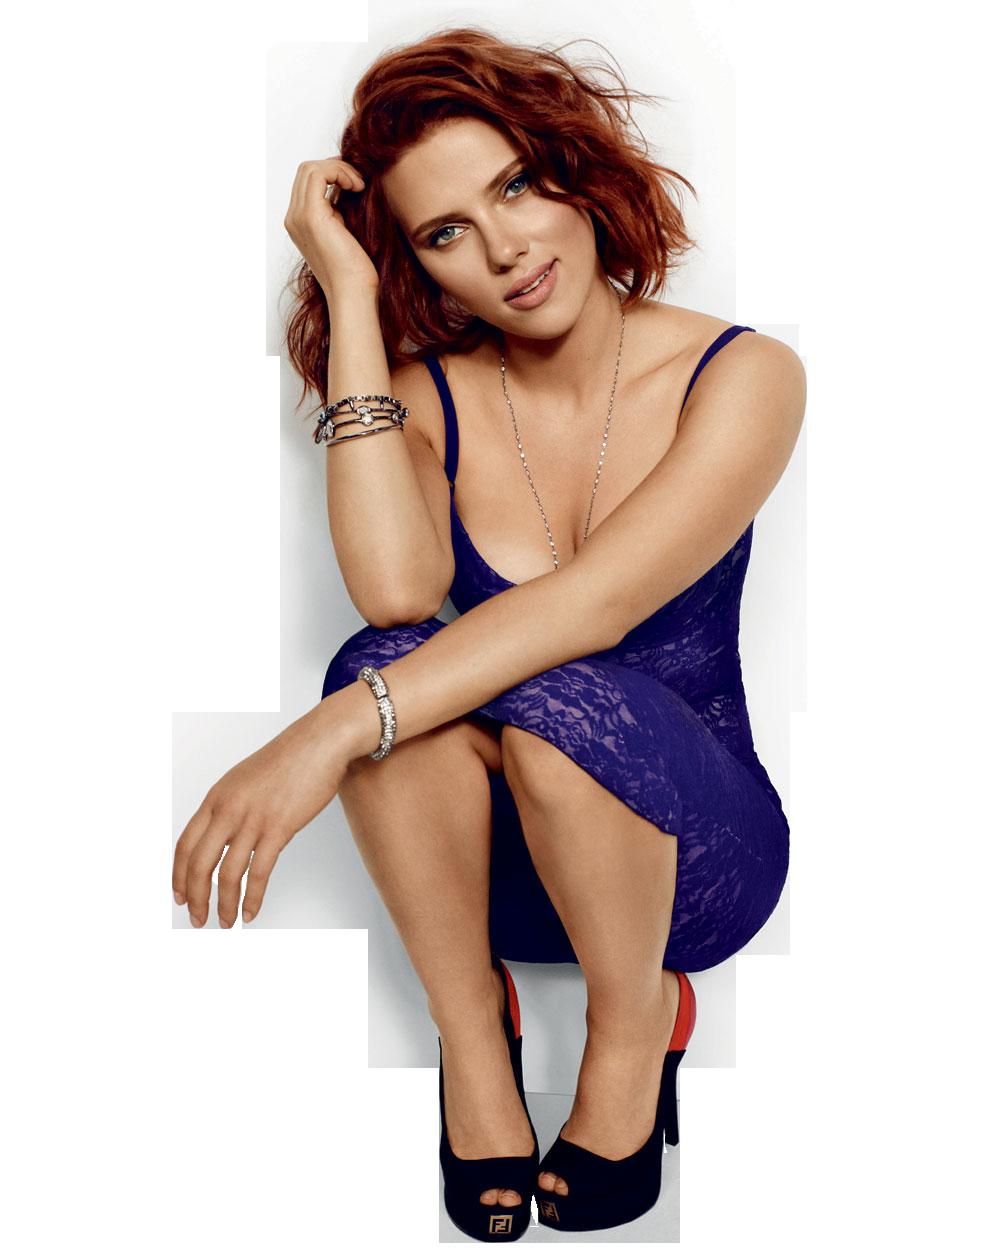 Scarlett johanson clipart